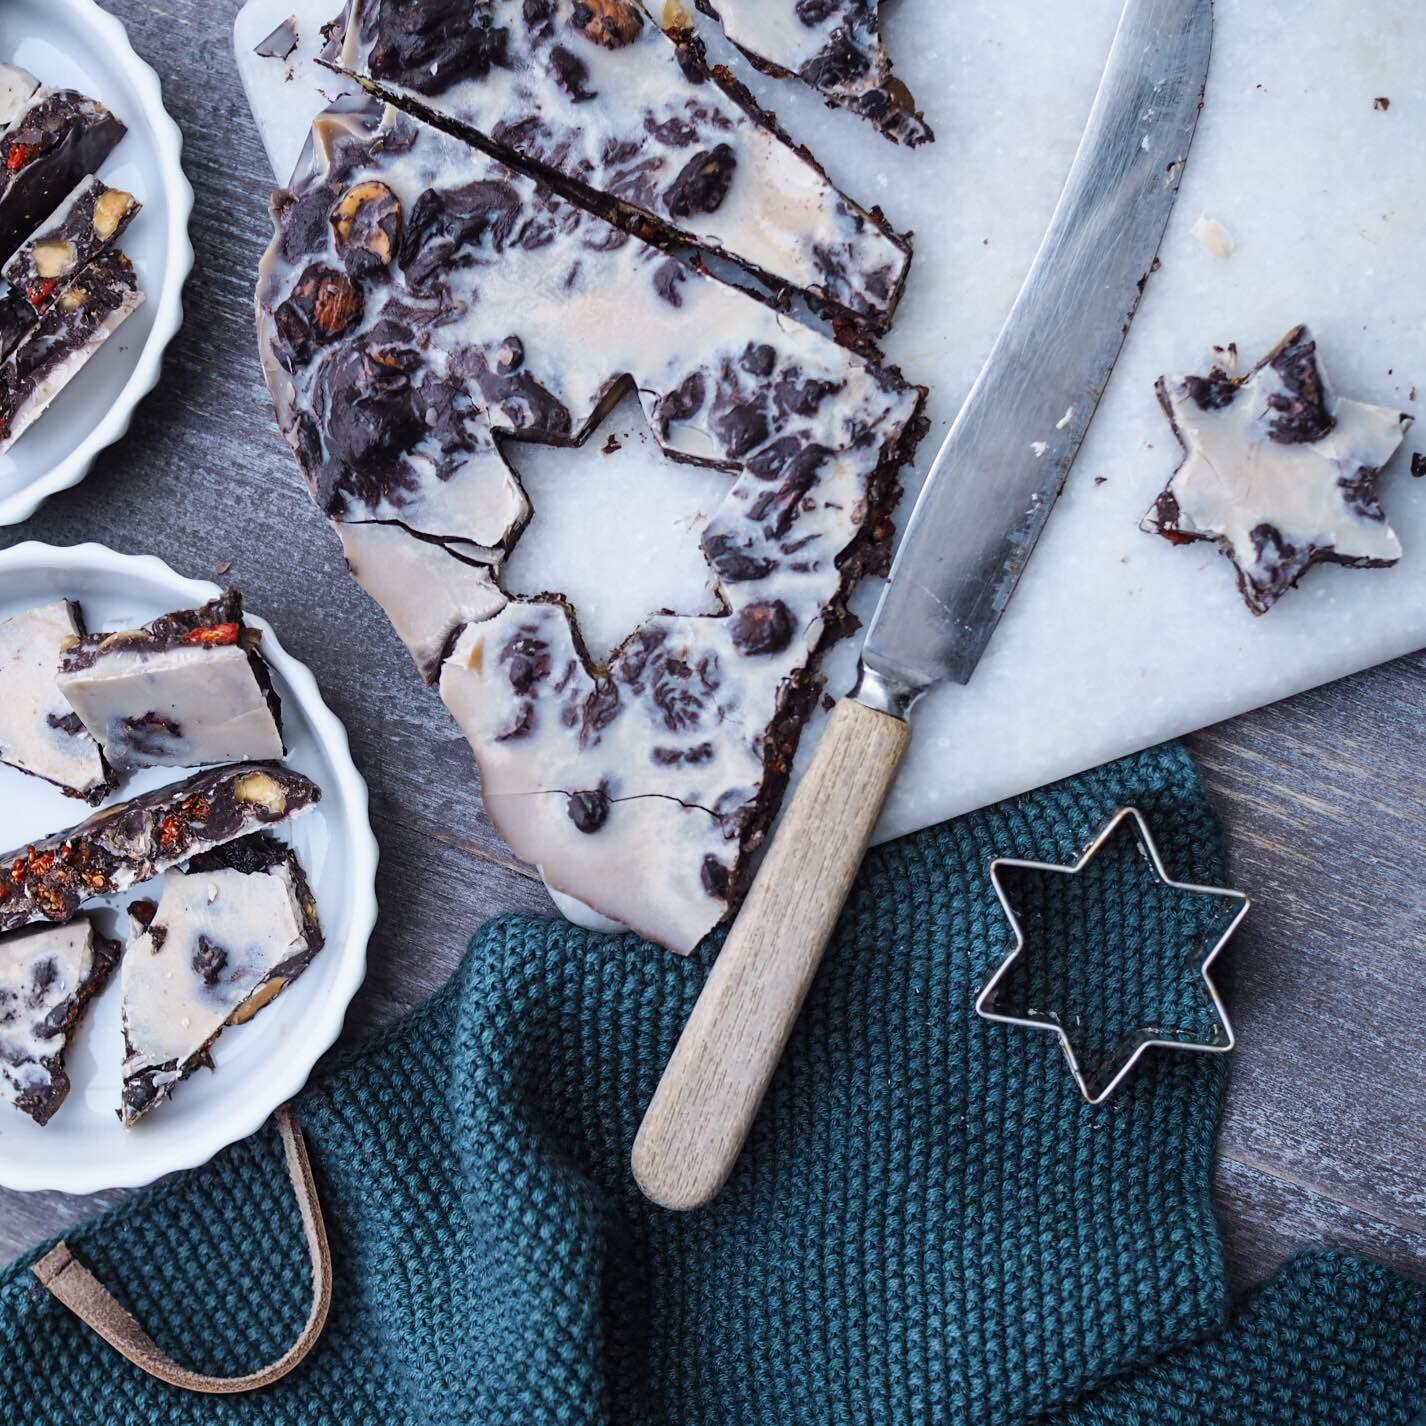 Sund eller i hvert fald sundere chokolade. Glutenfri, vegansk, laktosefri og med masser af nødder og tørrede bær